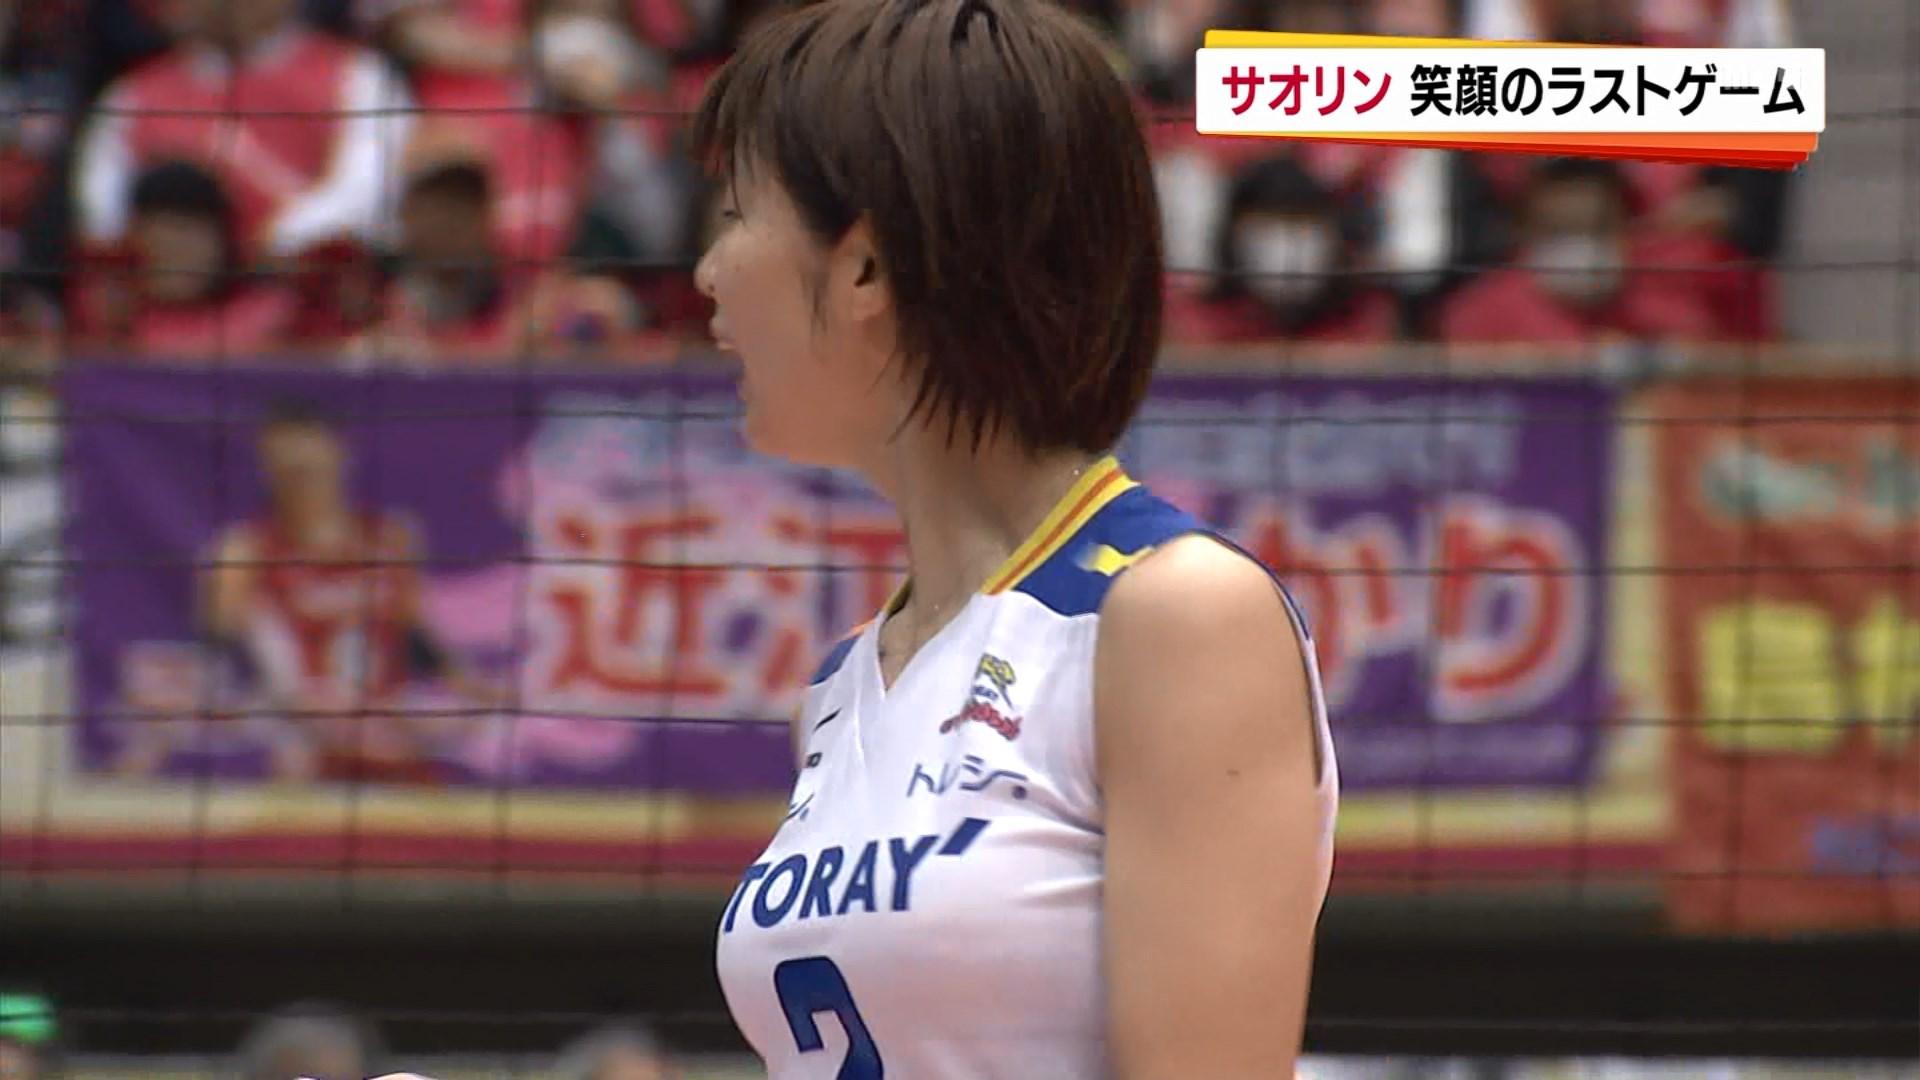 木村沙織 引退試合でフィニッシュの美巨乳サービス来た☆☆wwwwwwwwwwwwwwww